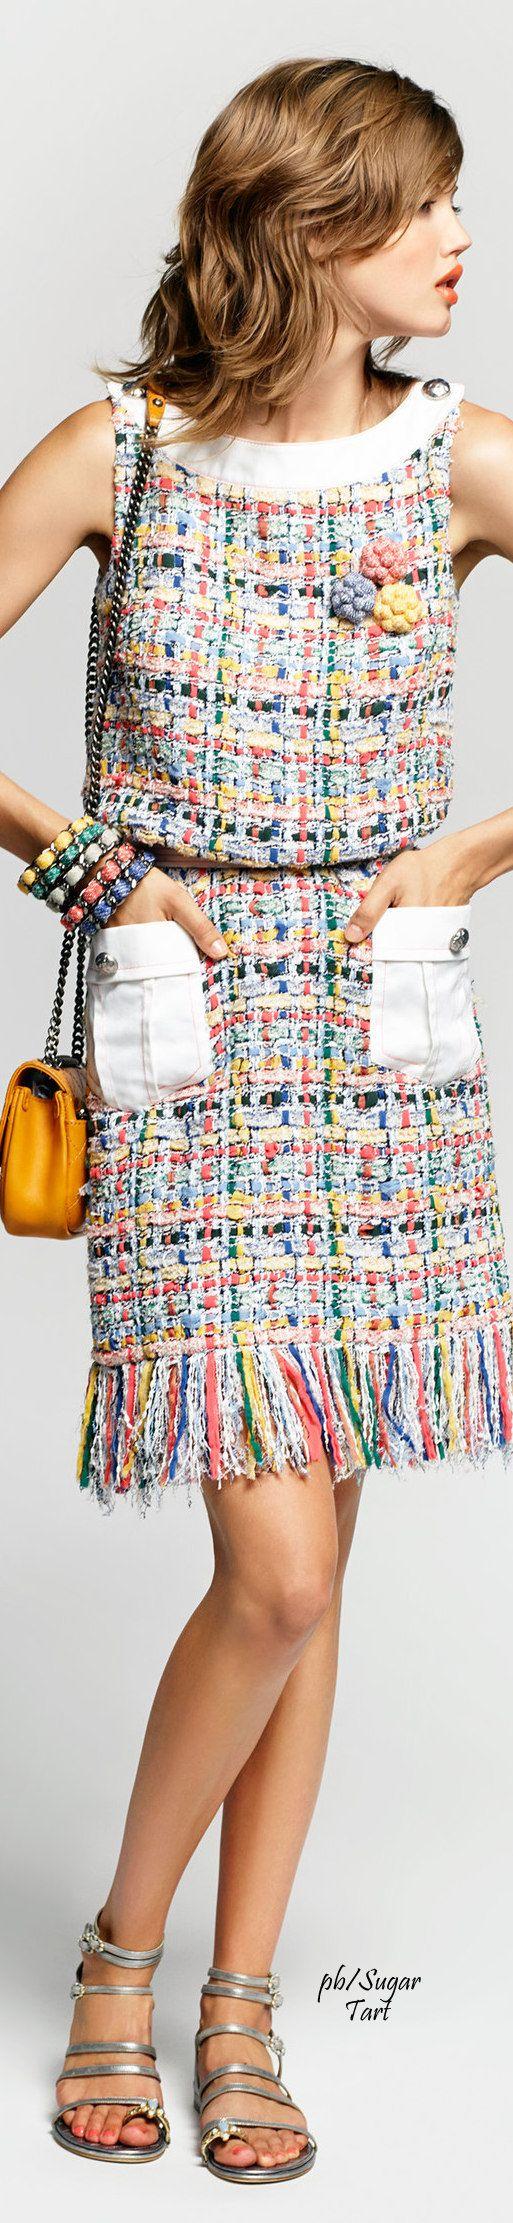 Chanel S/S 2015  #vestido #tubinho #canoa #bolso #tweed #cinto #cor